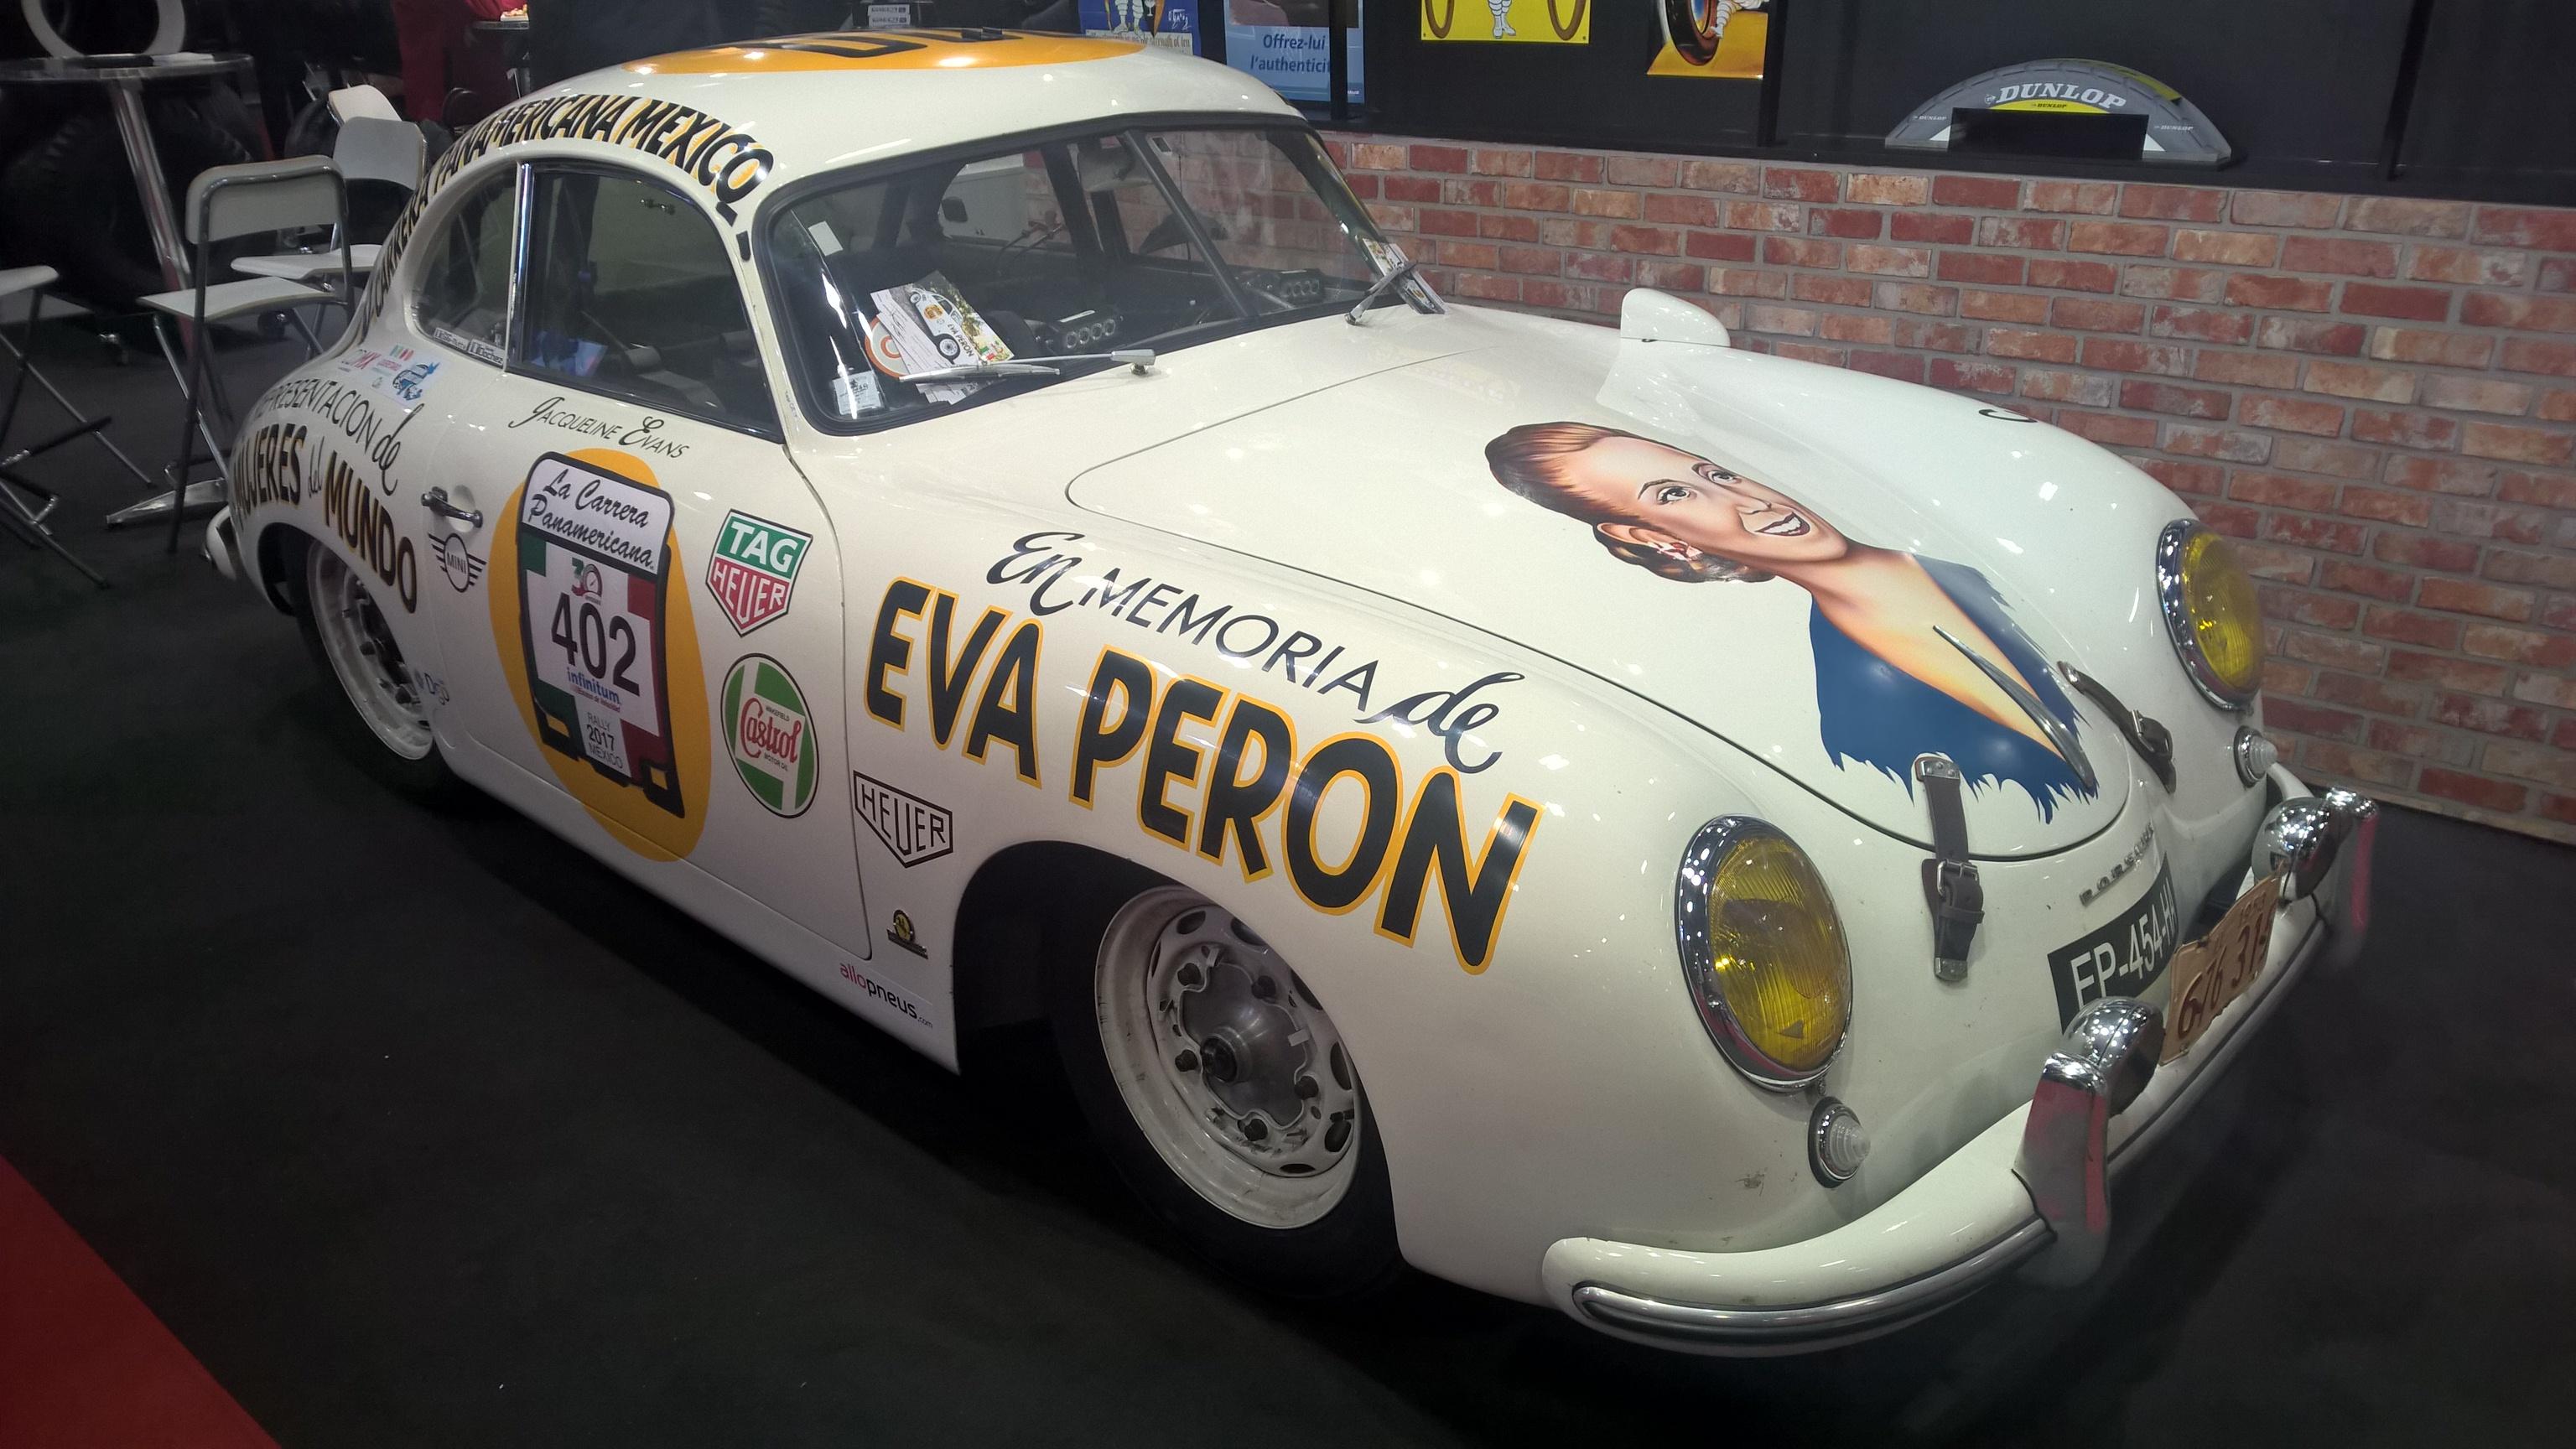 Porsche 356 er alltid kult, og i hvert fall en som har deltatt i historisk racing, med Carrera-Panamericana stuk med Eva Peron på panseret. Kulhetsfaktor: 10/10.